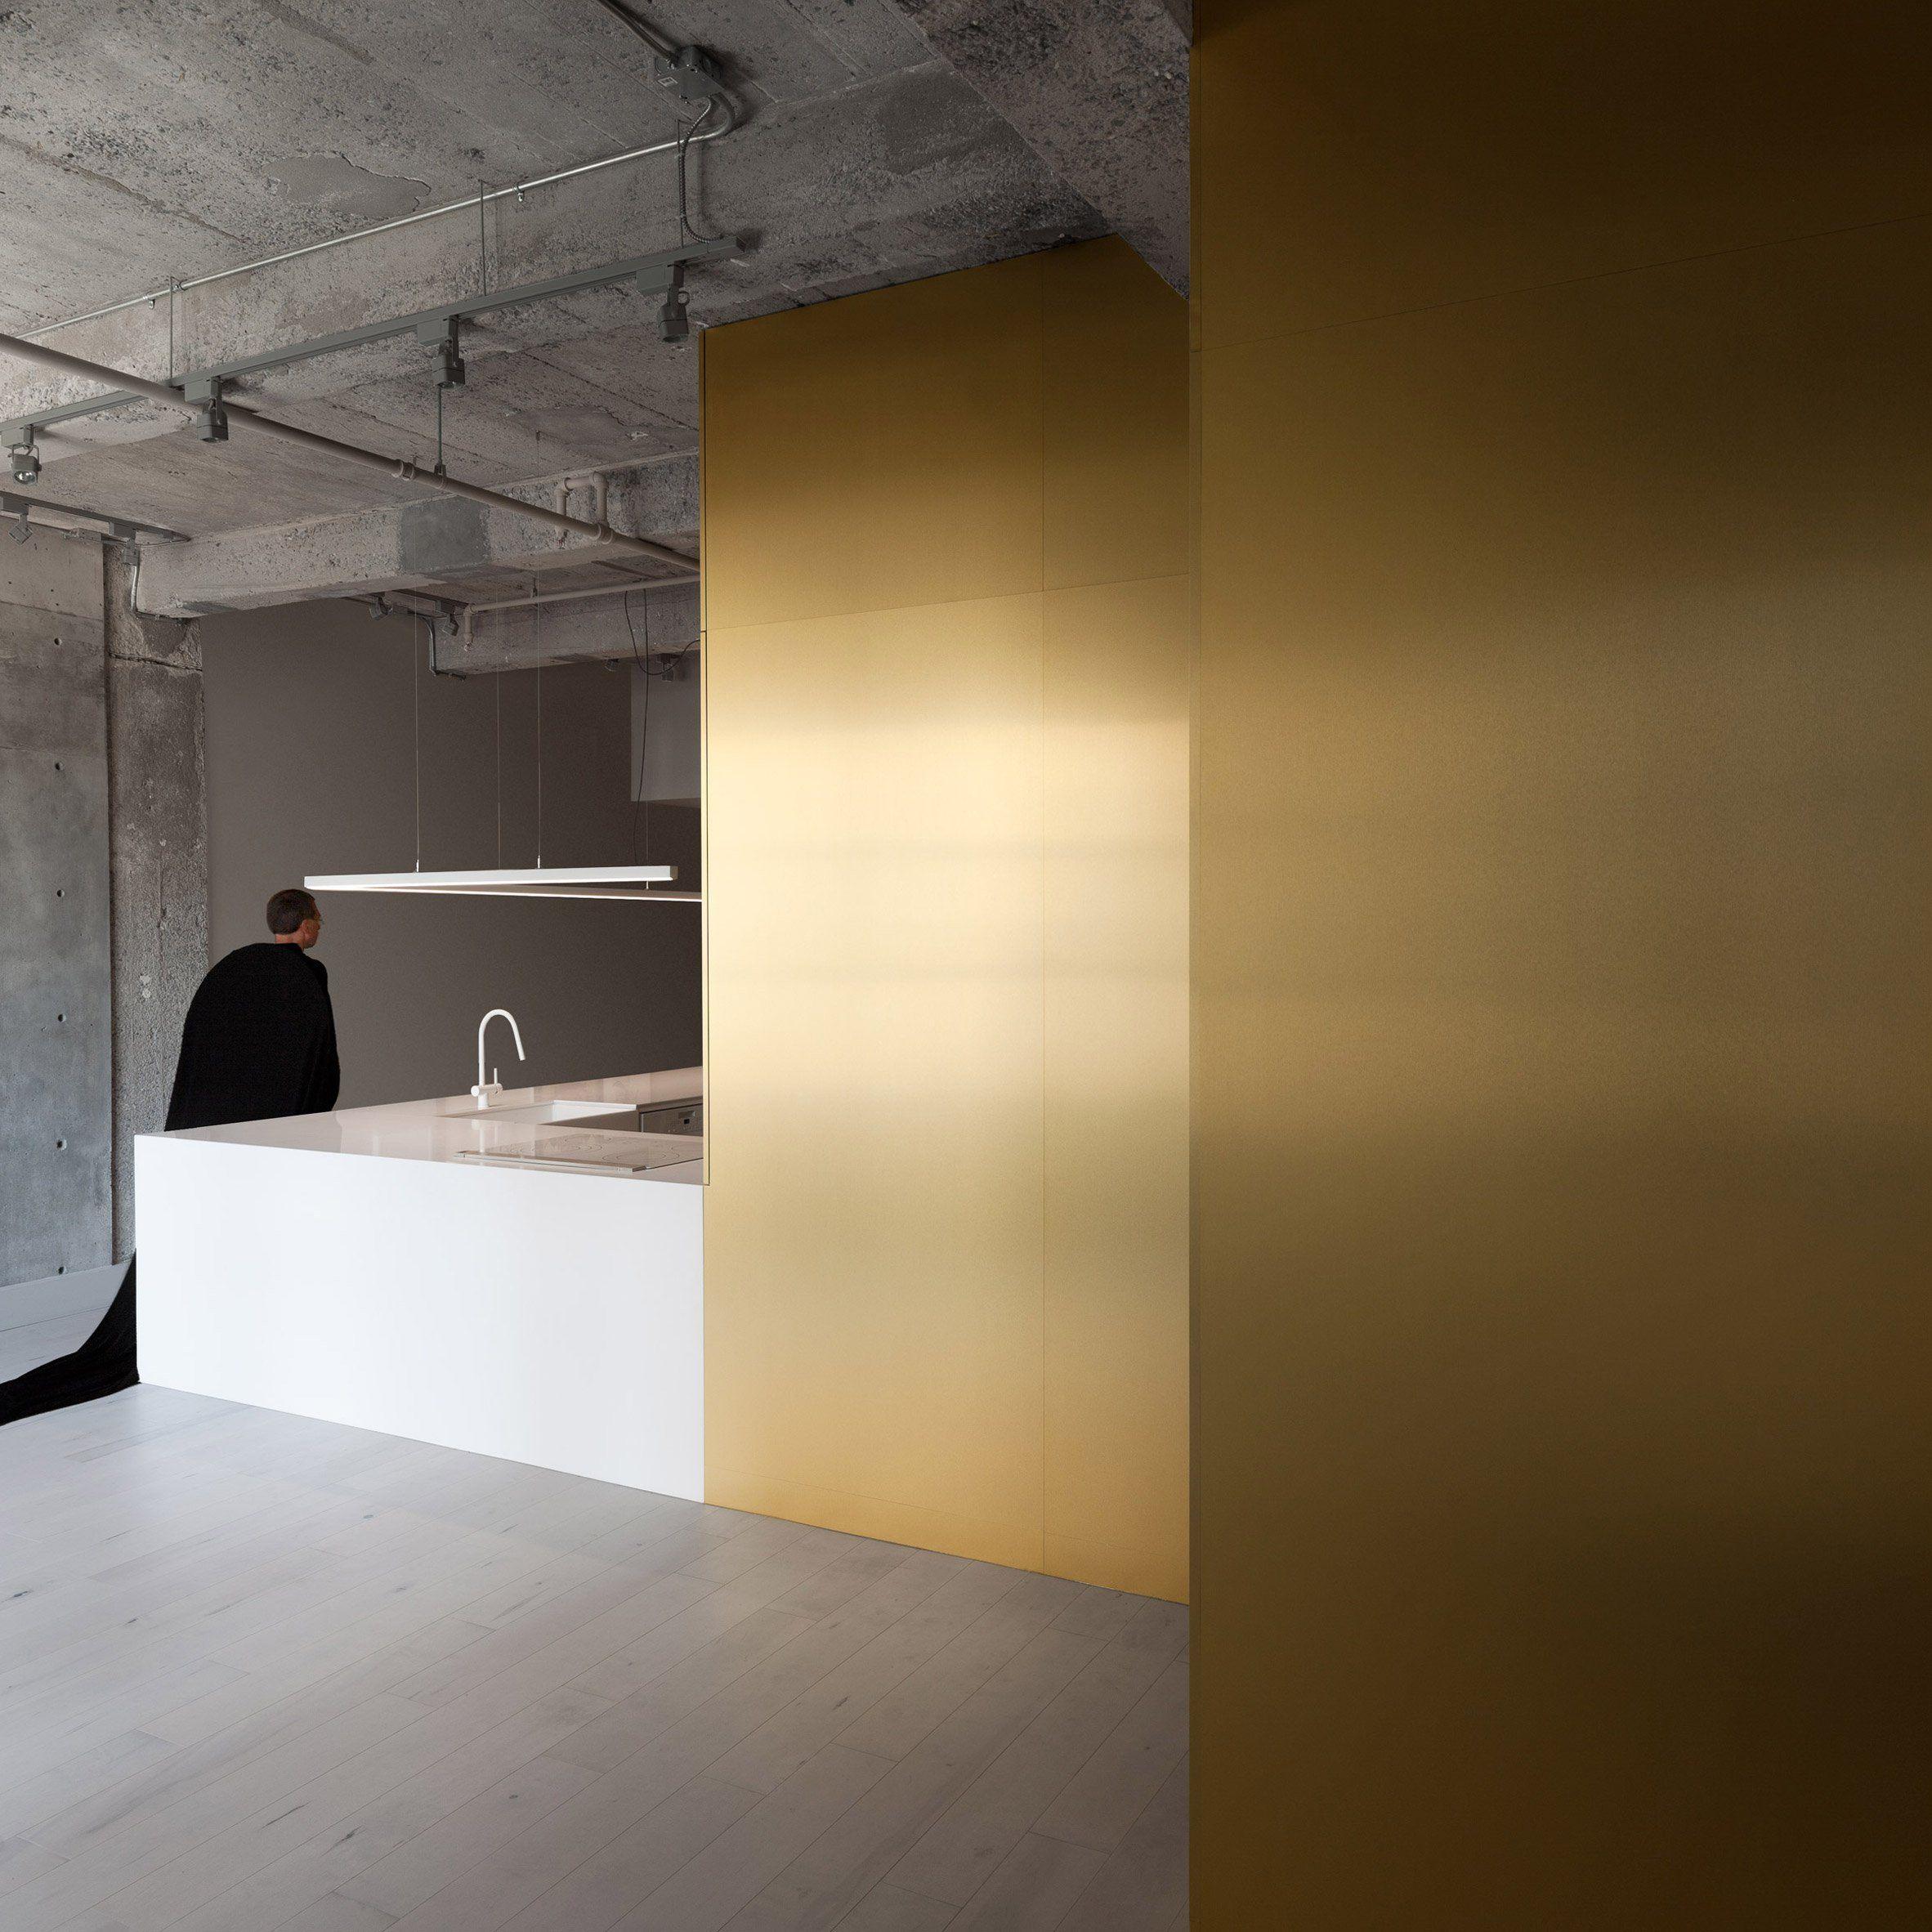 dezeen roundups best residential interiors of 2017 interior rh pinterest com